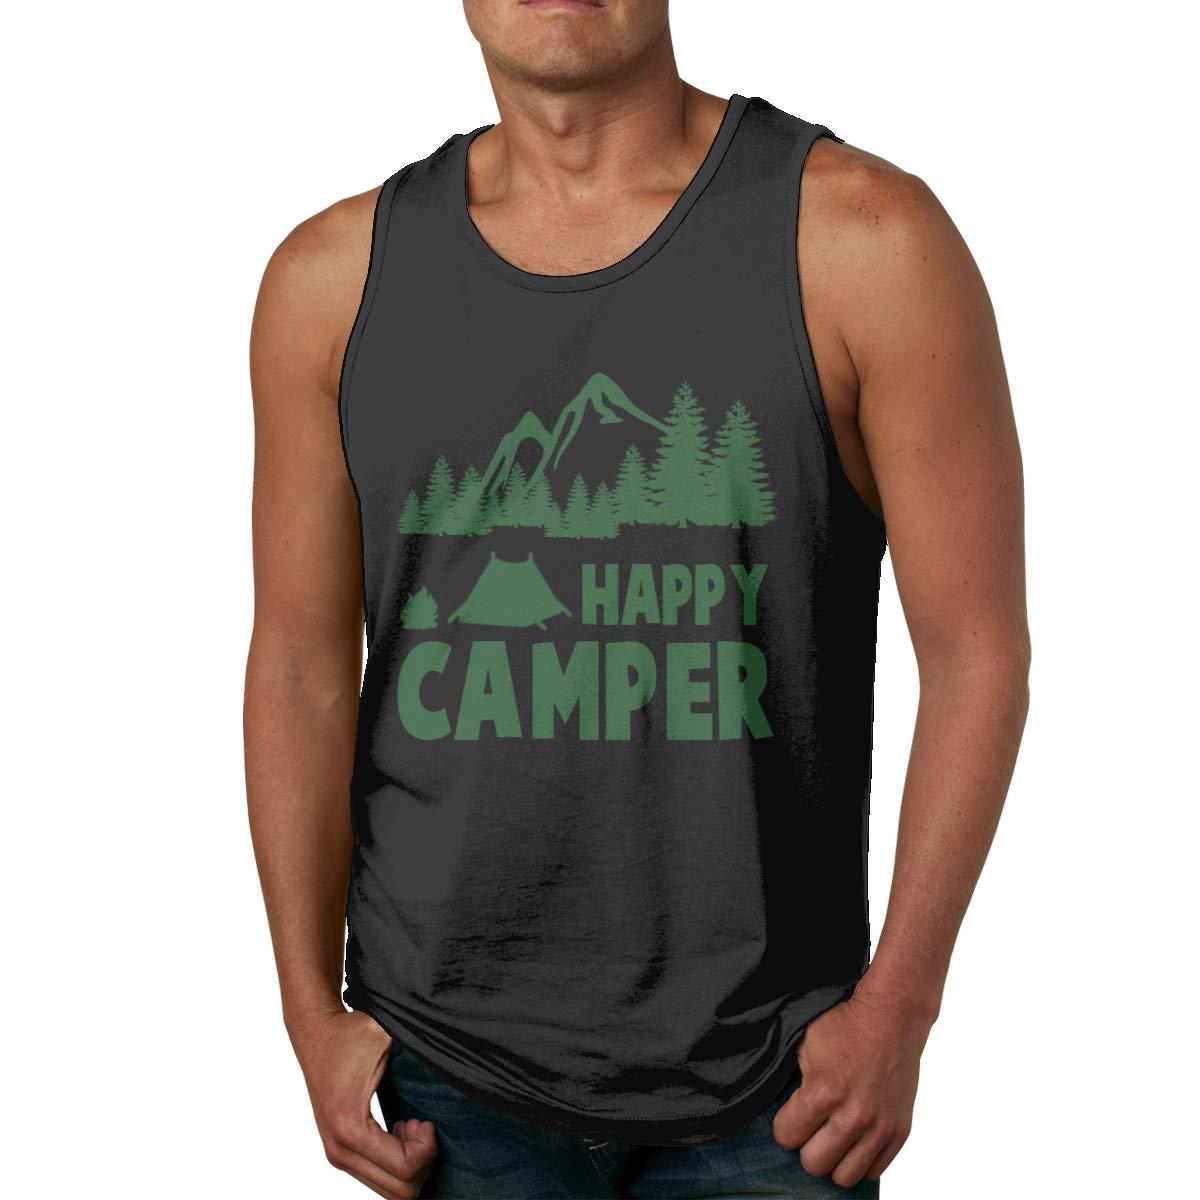 Happy Camper Sleeveless Tank Tops Shirt Fit Mens